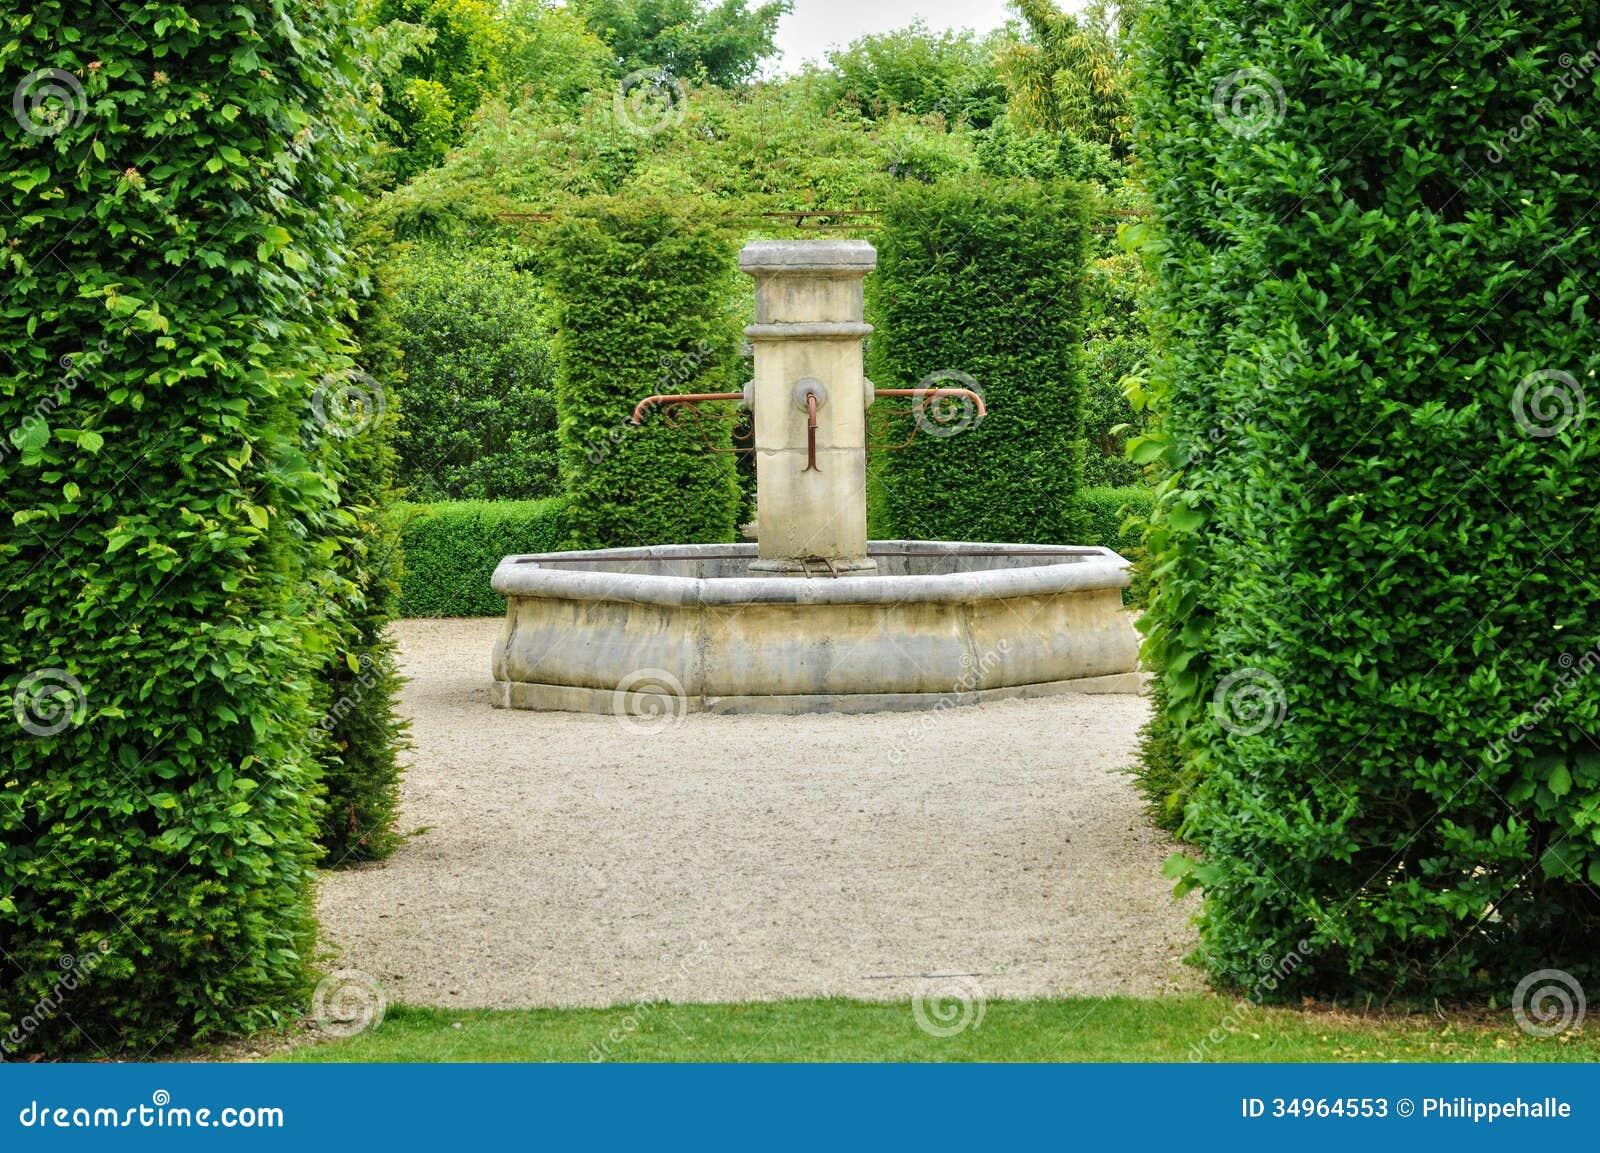 Les jardins du pays d auge in cambremer in normandie stock for Les jardins en france